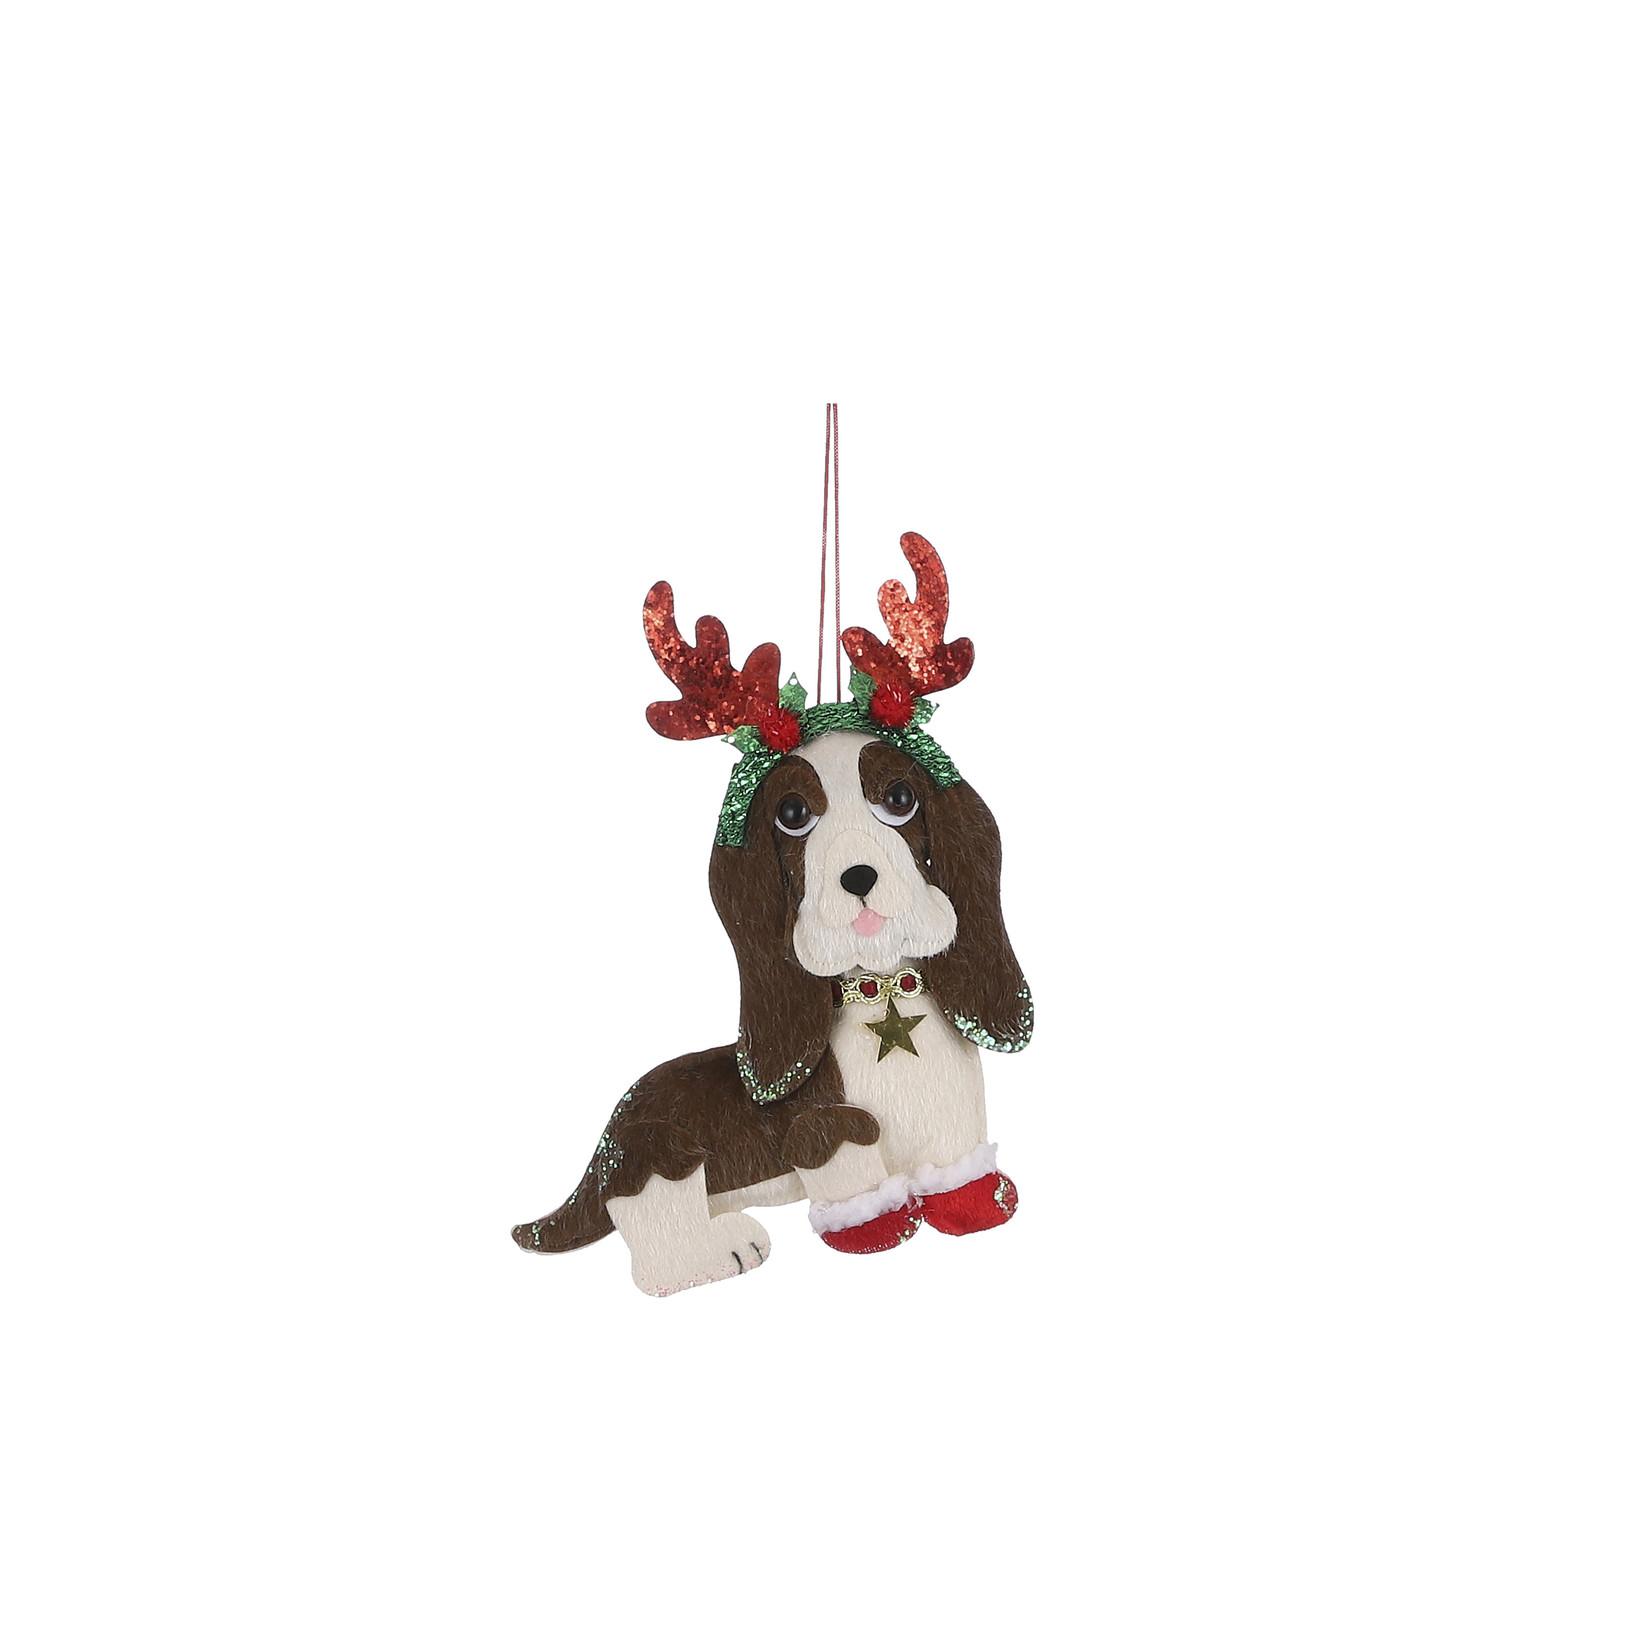 House of Seasons Ornament dog brown